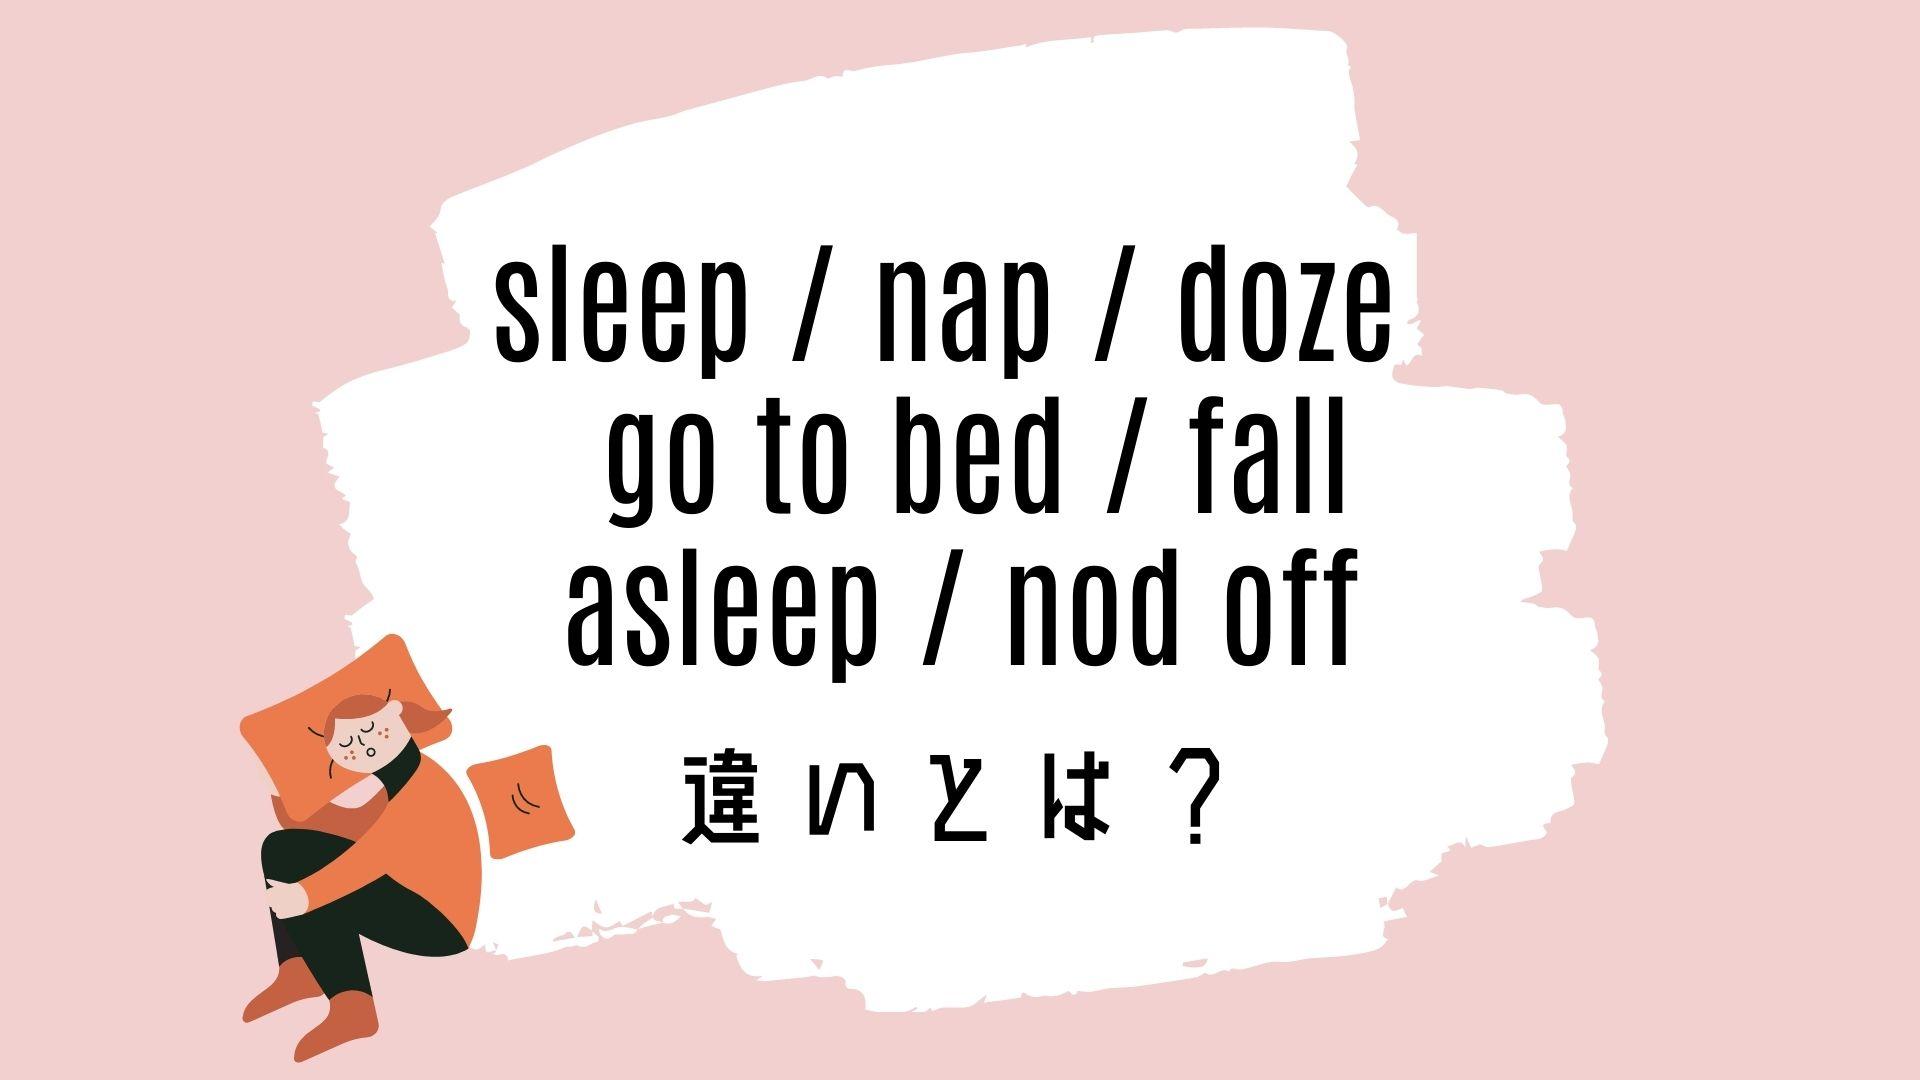 sleep / nap / doze / go to bed / fall asleep / nod offの意味の違いとは?使い方を解説